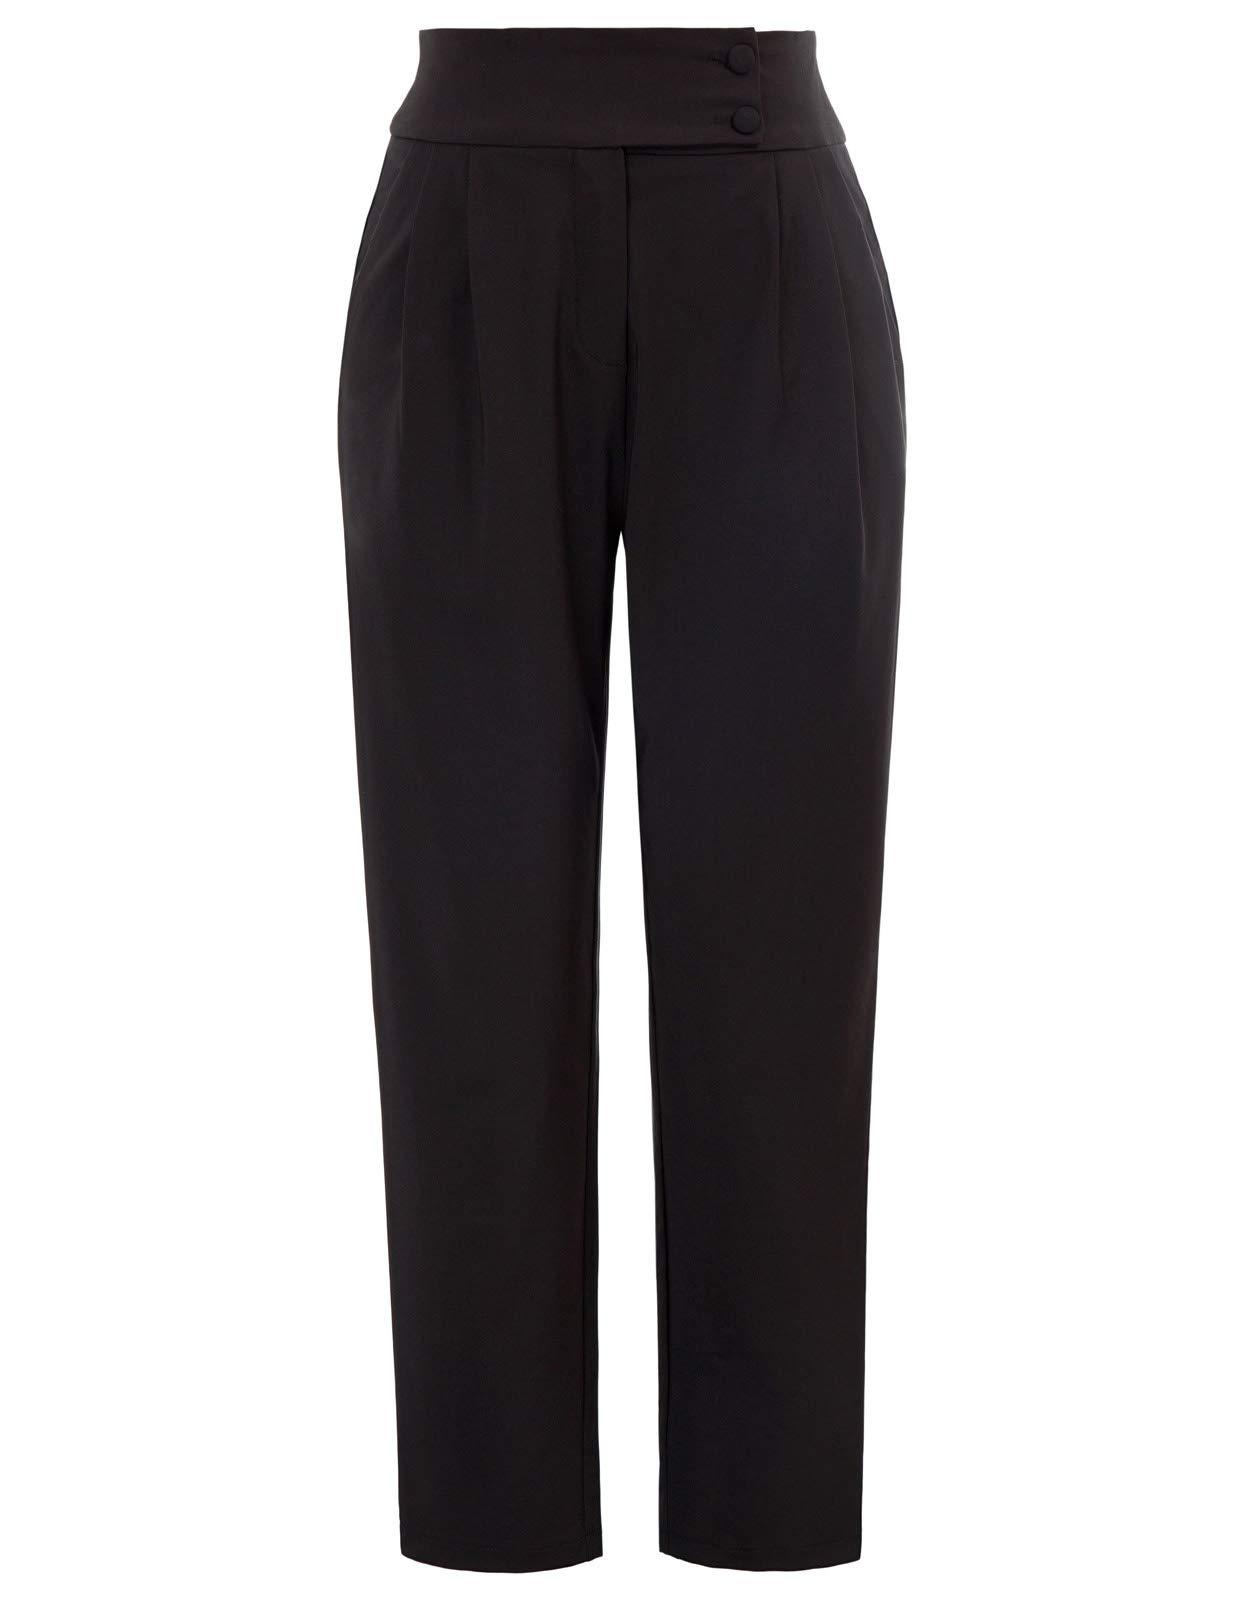 GRACE KARIN Women's Casual Work Cropped Pant Pocket High Waist Button Trouser Pants